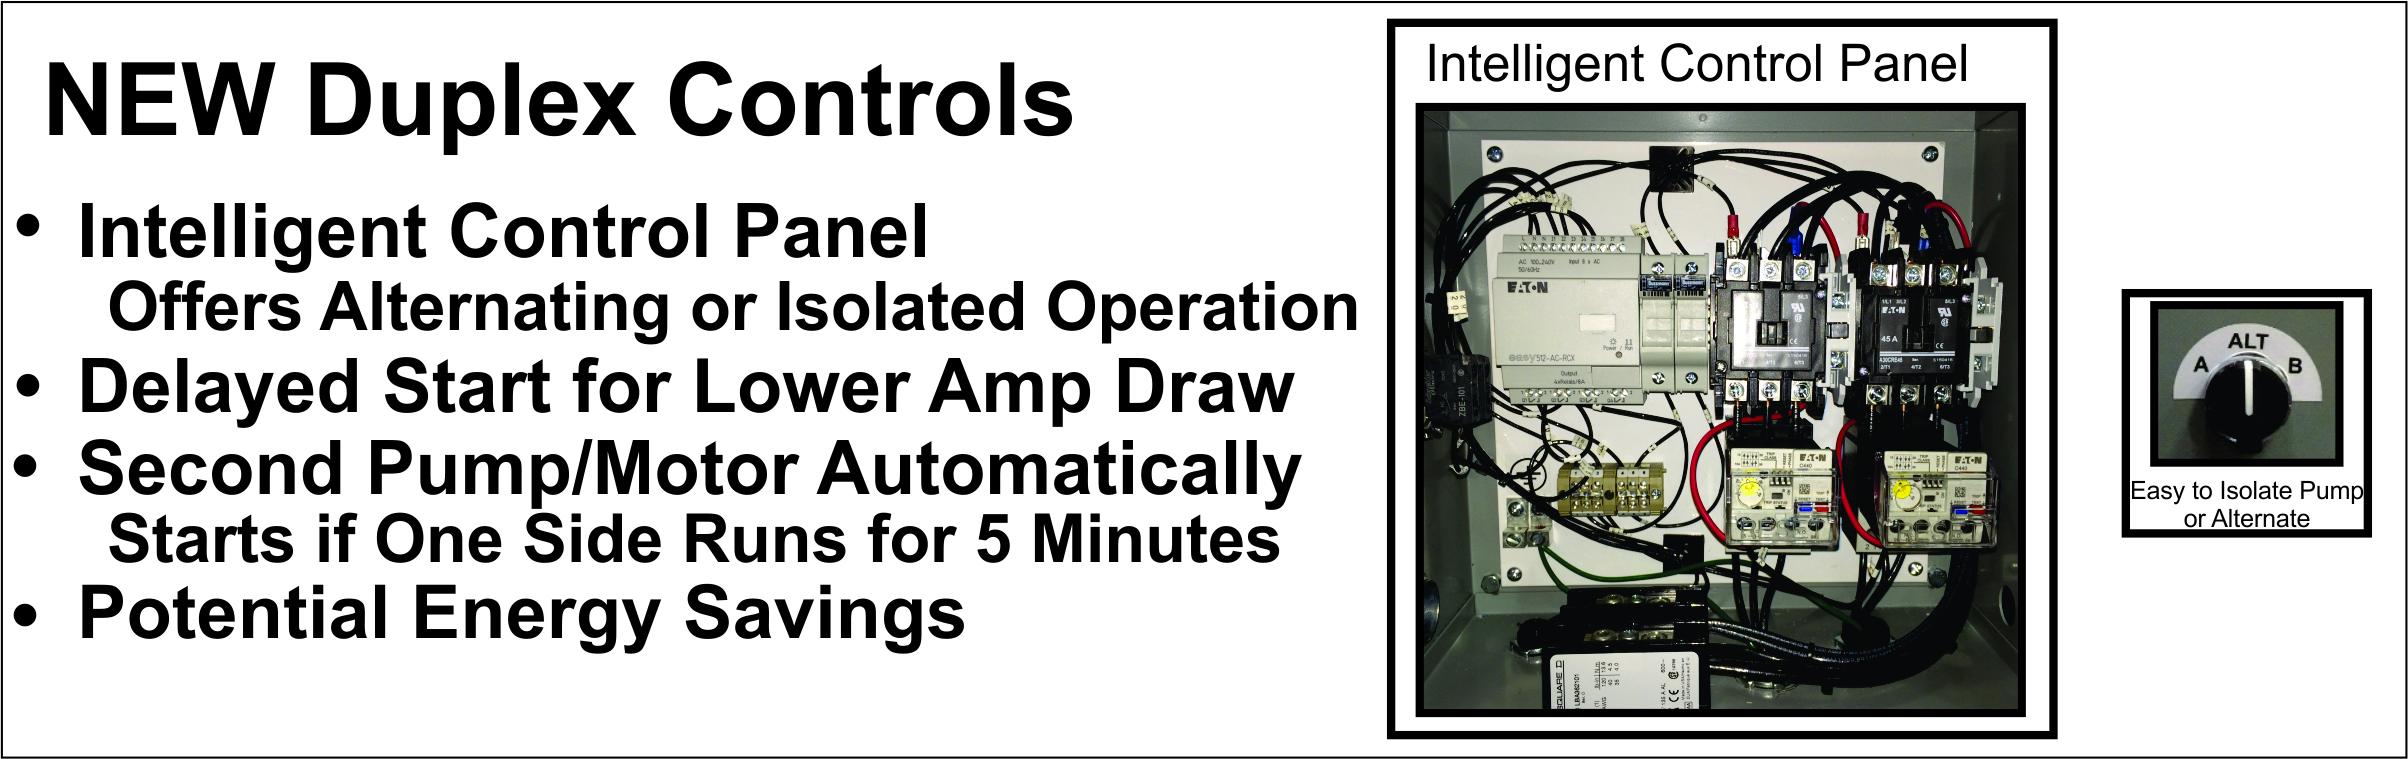 duplex-controls.jpg